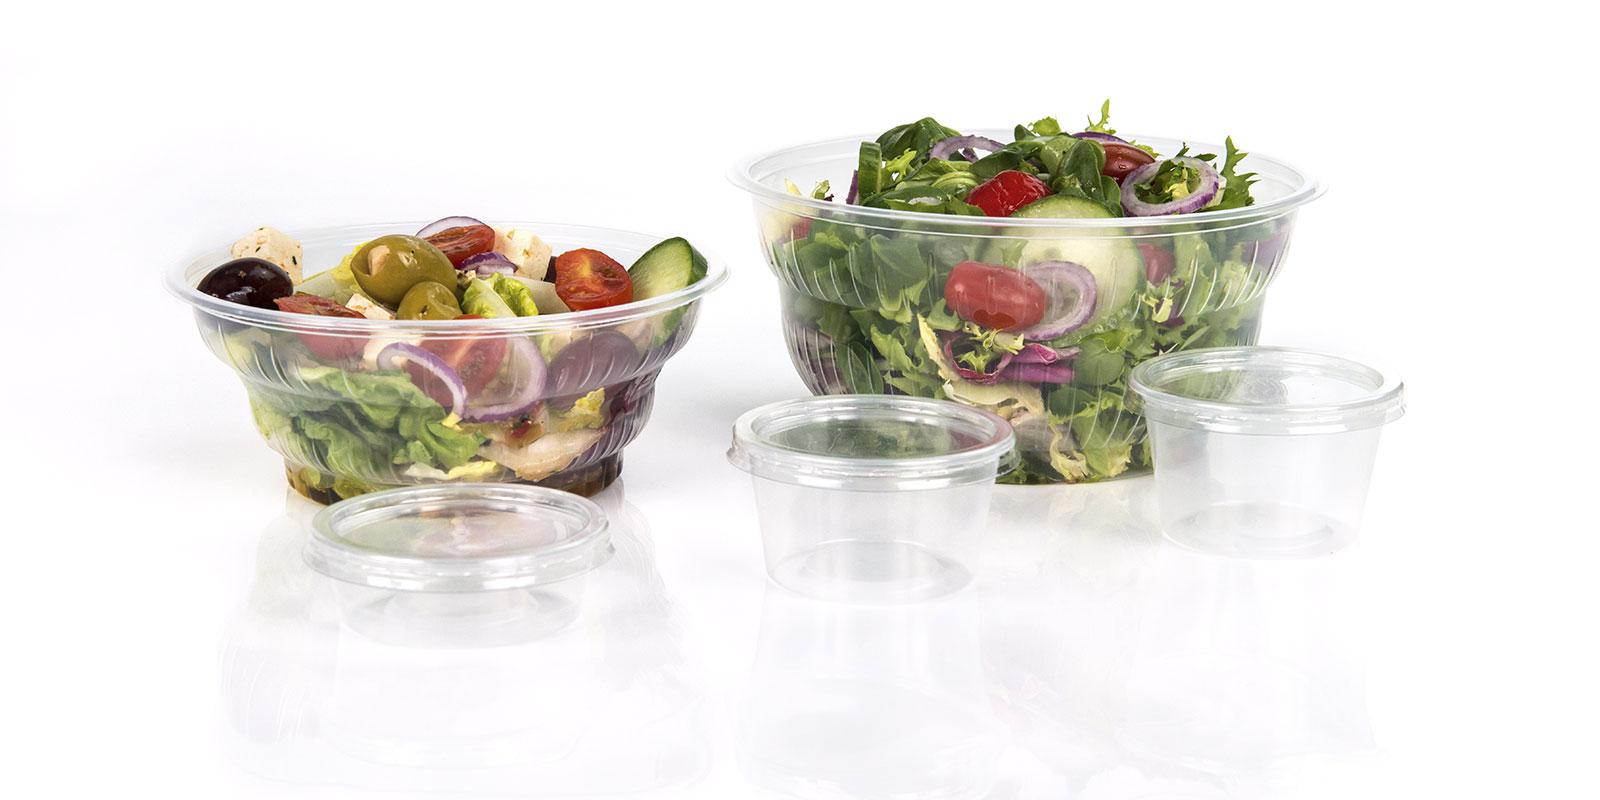 S750_S1140-Salat